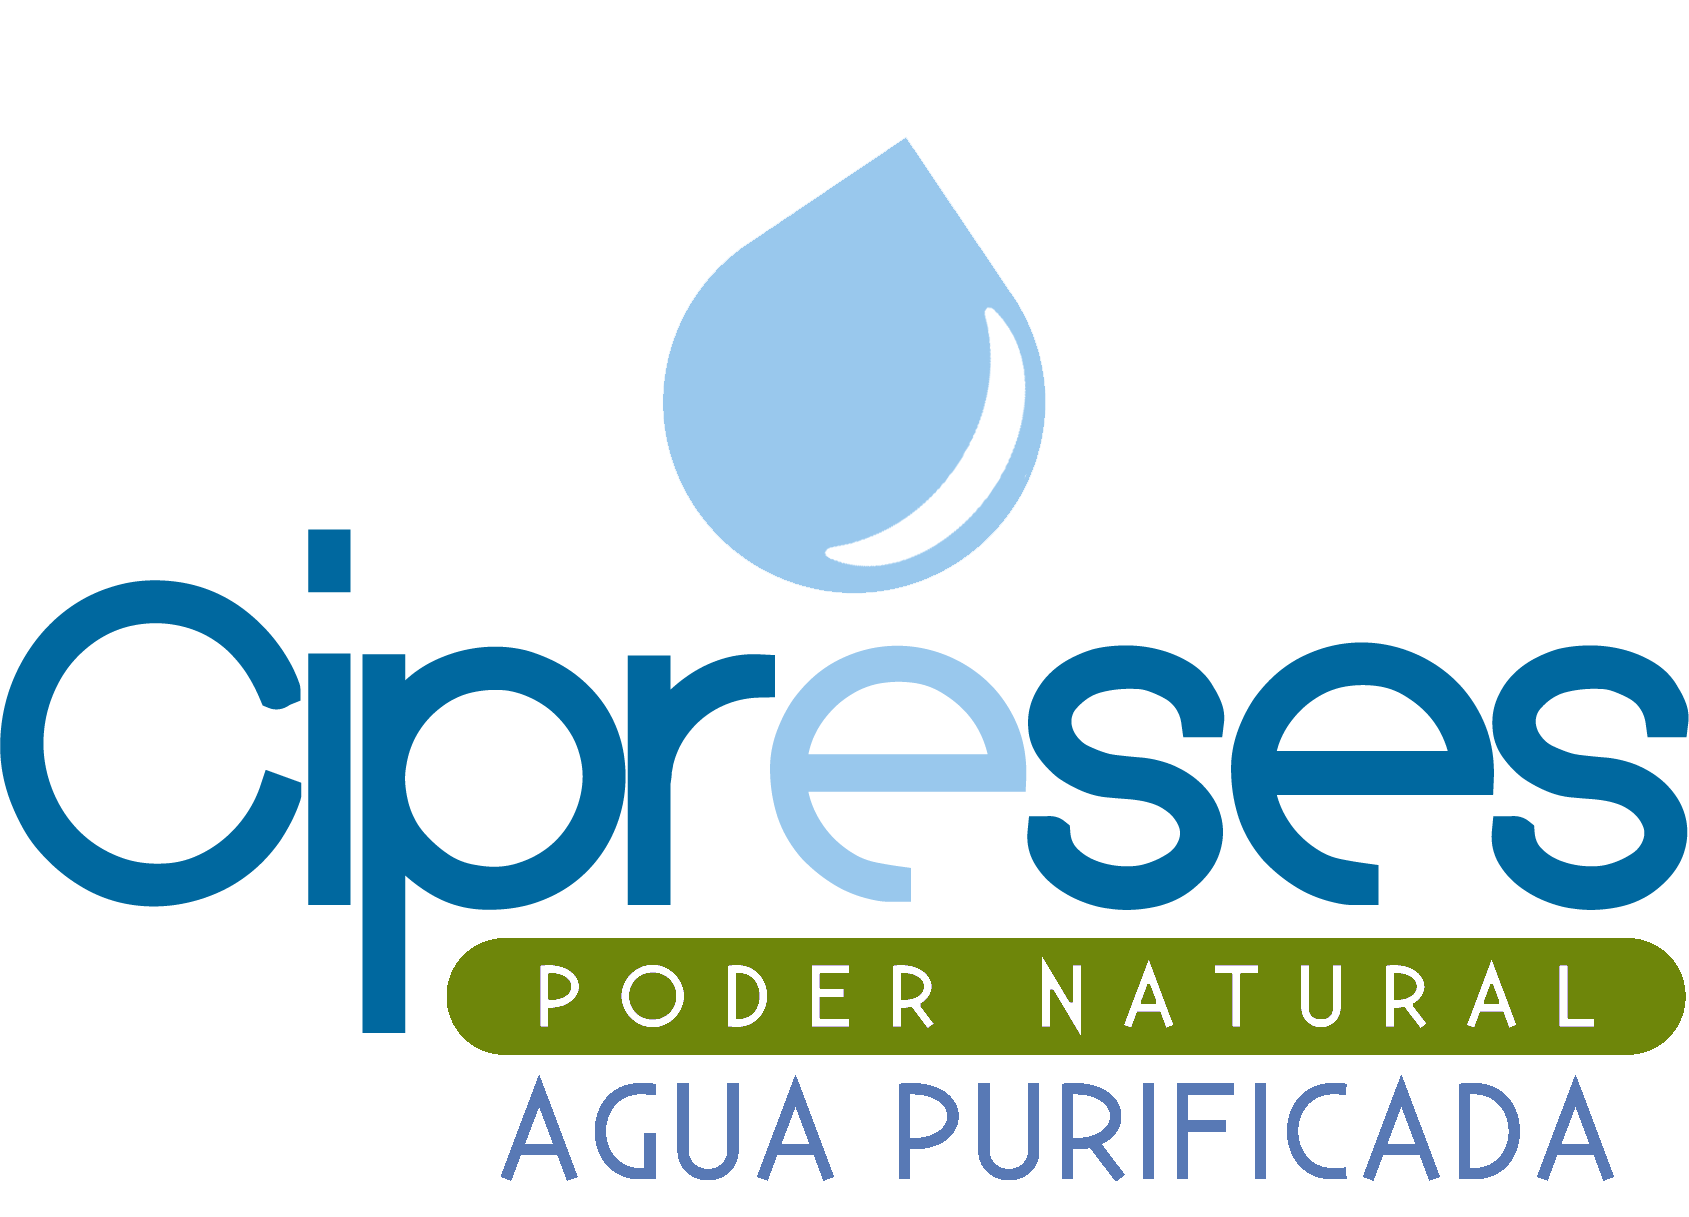 Agua Cipreses